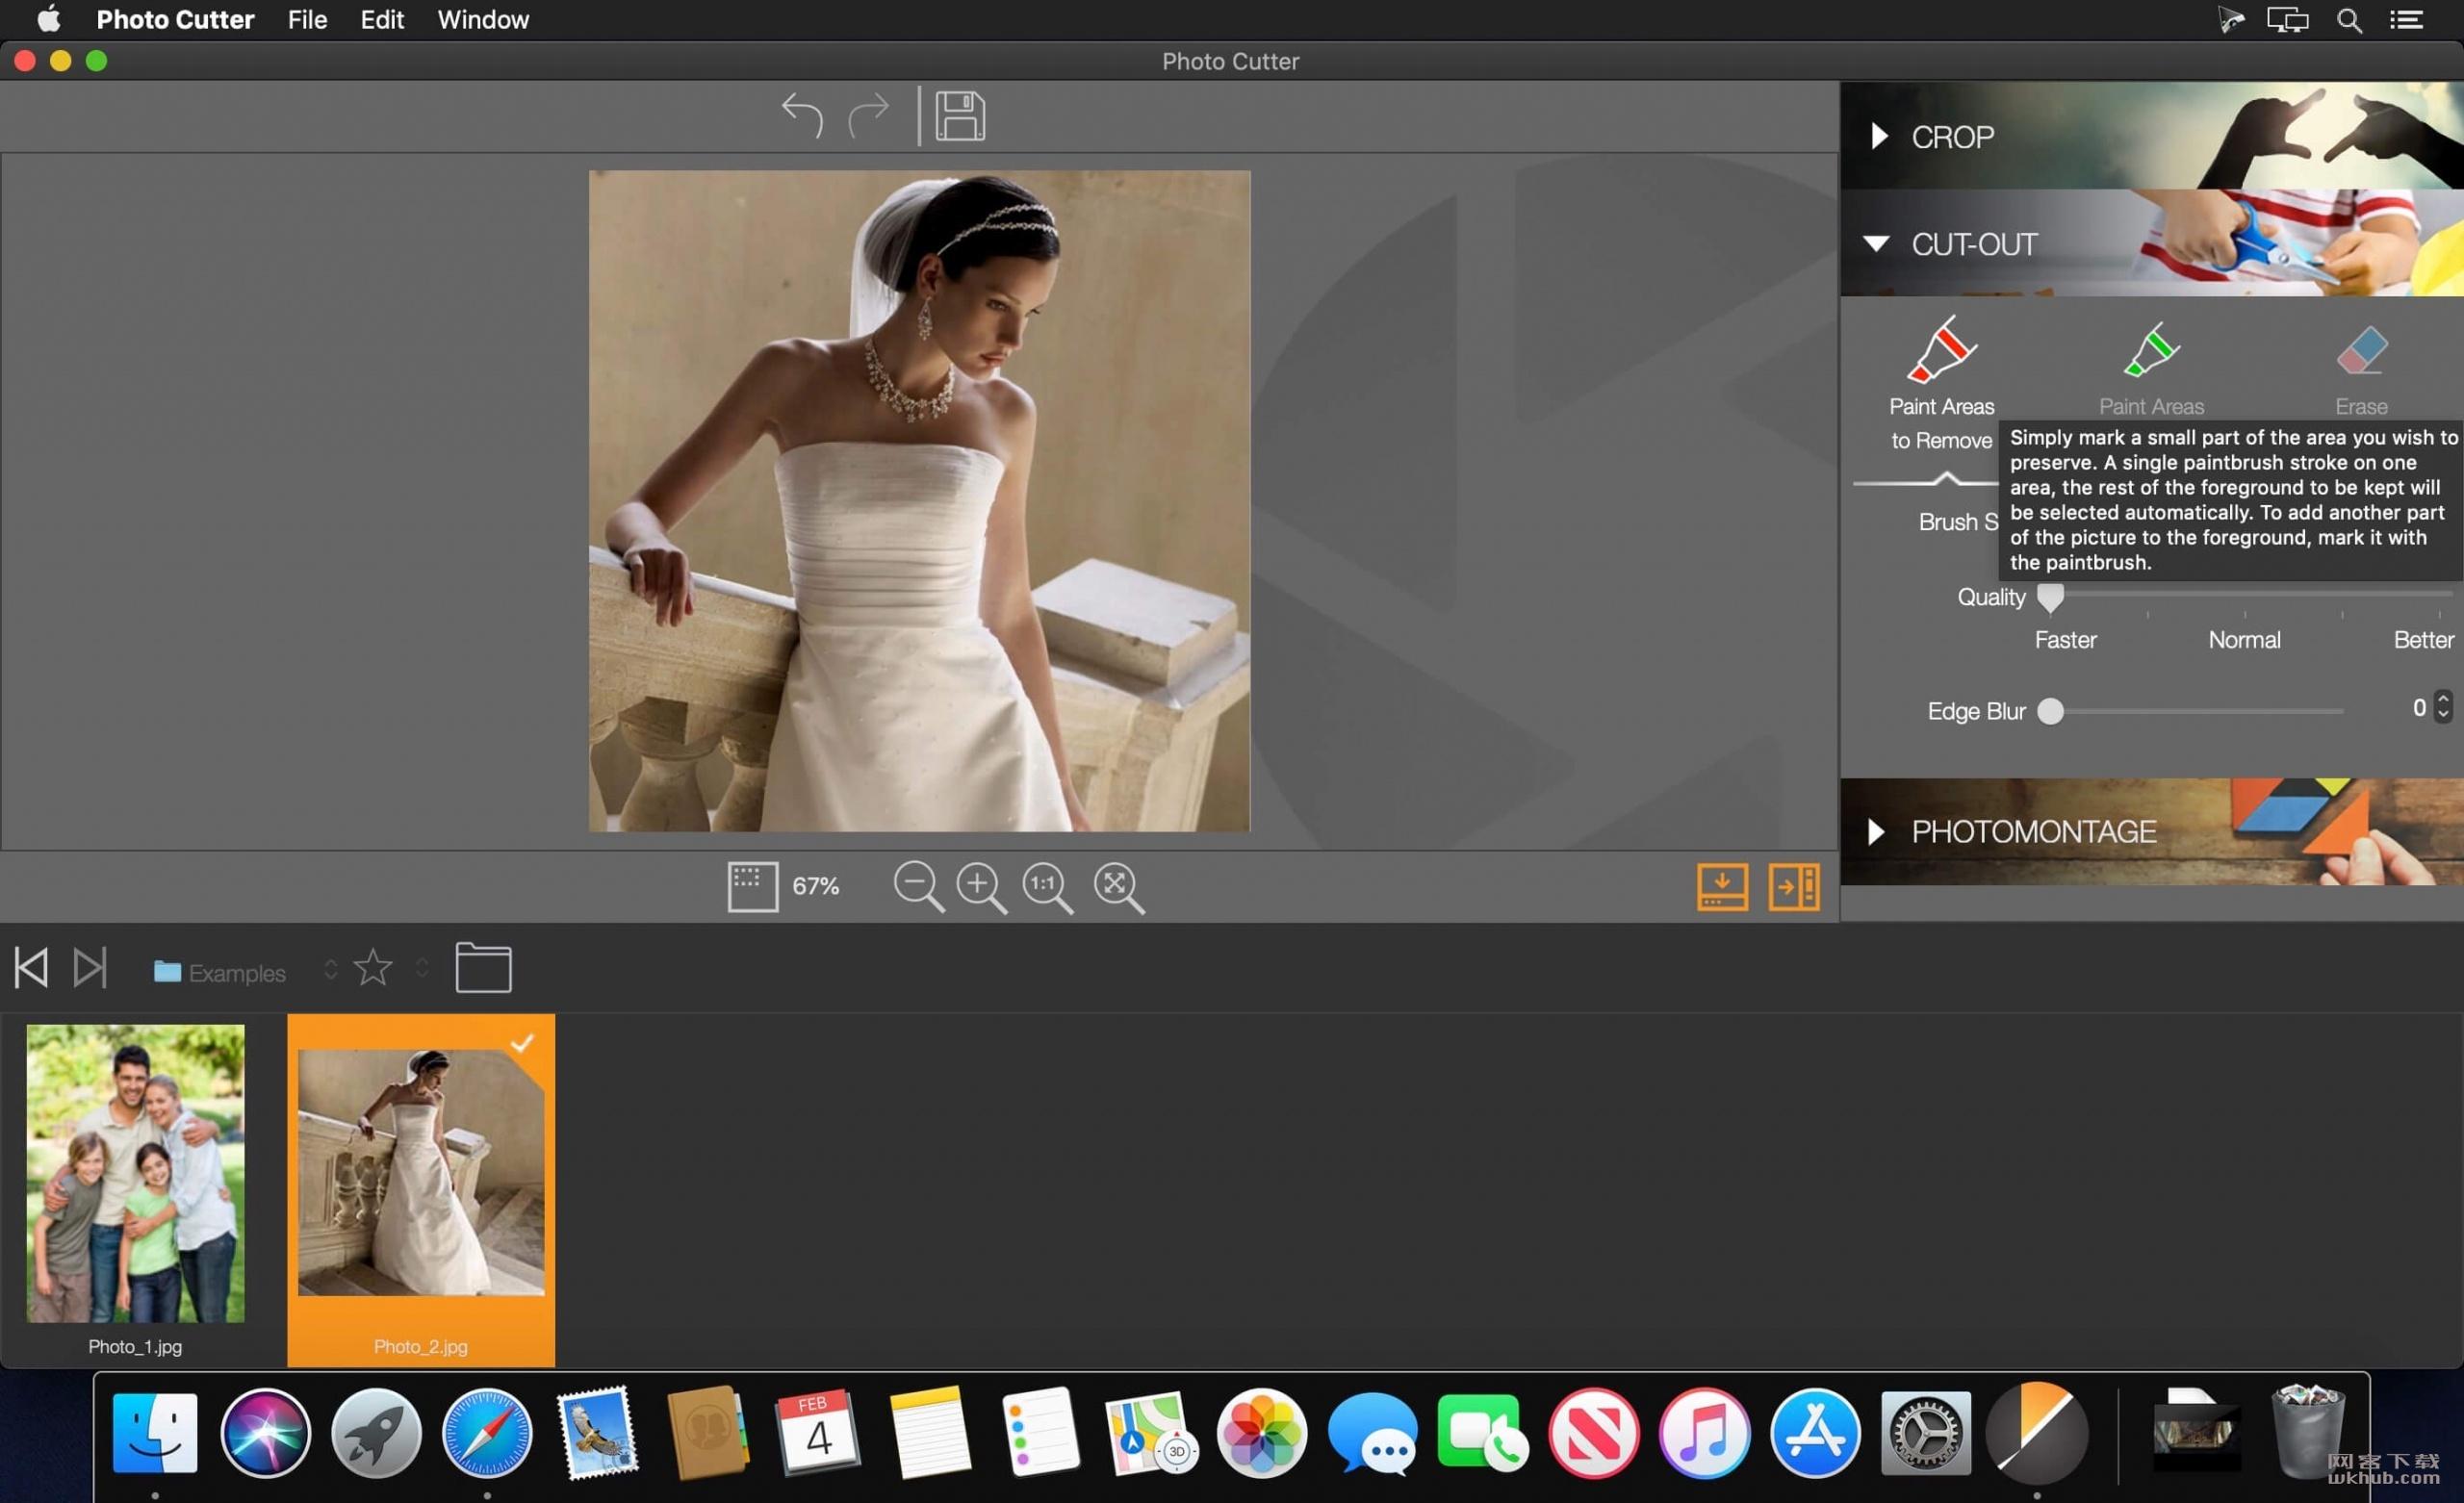 Wondershare Photo Cutter 1.0.7 照片剪裁工具